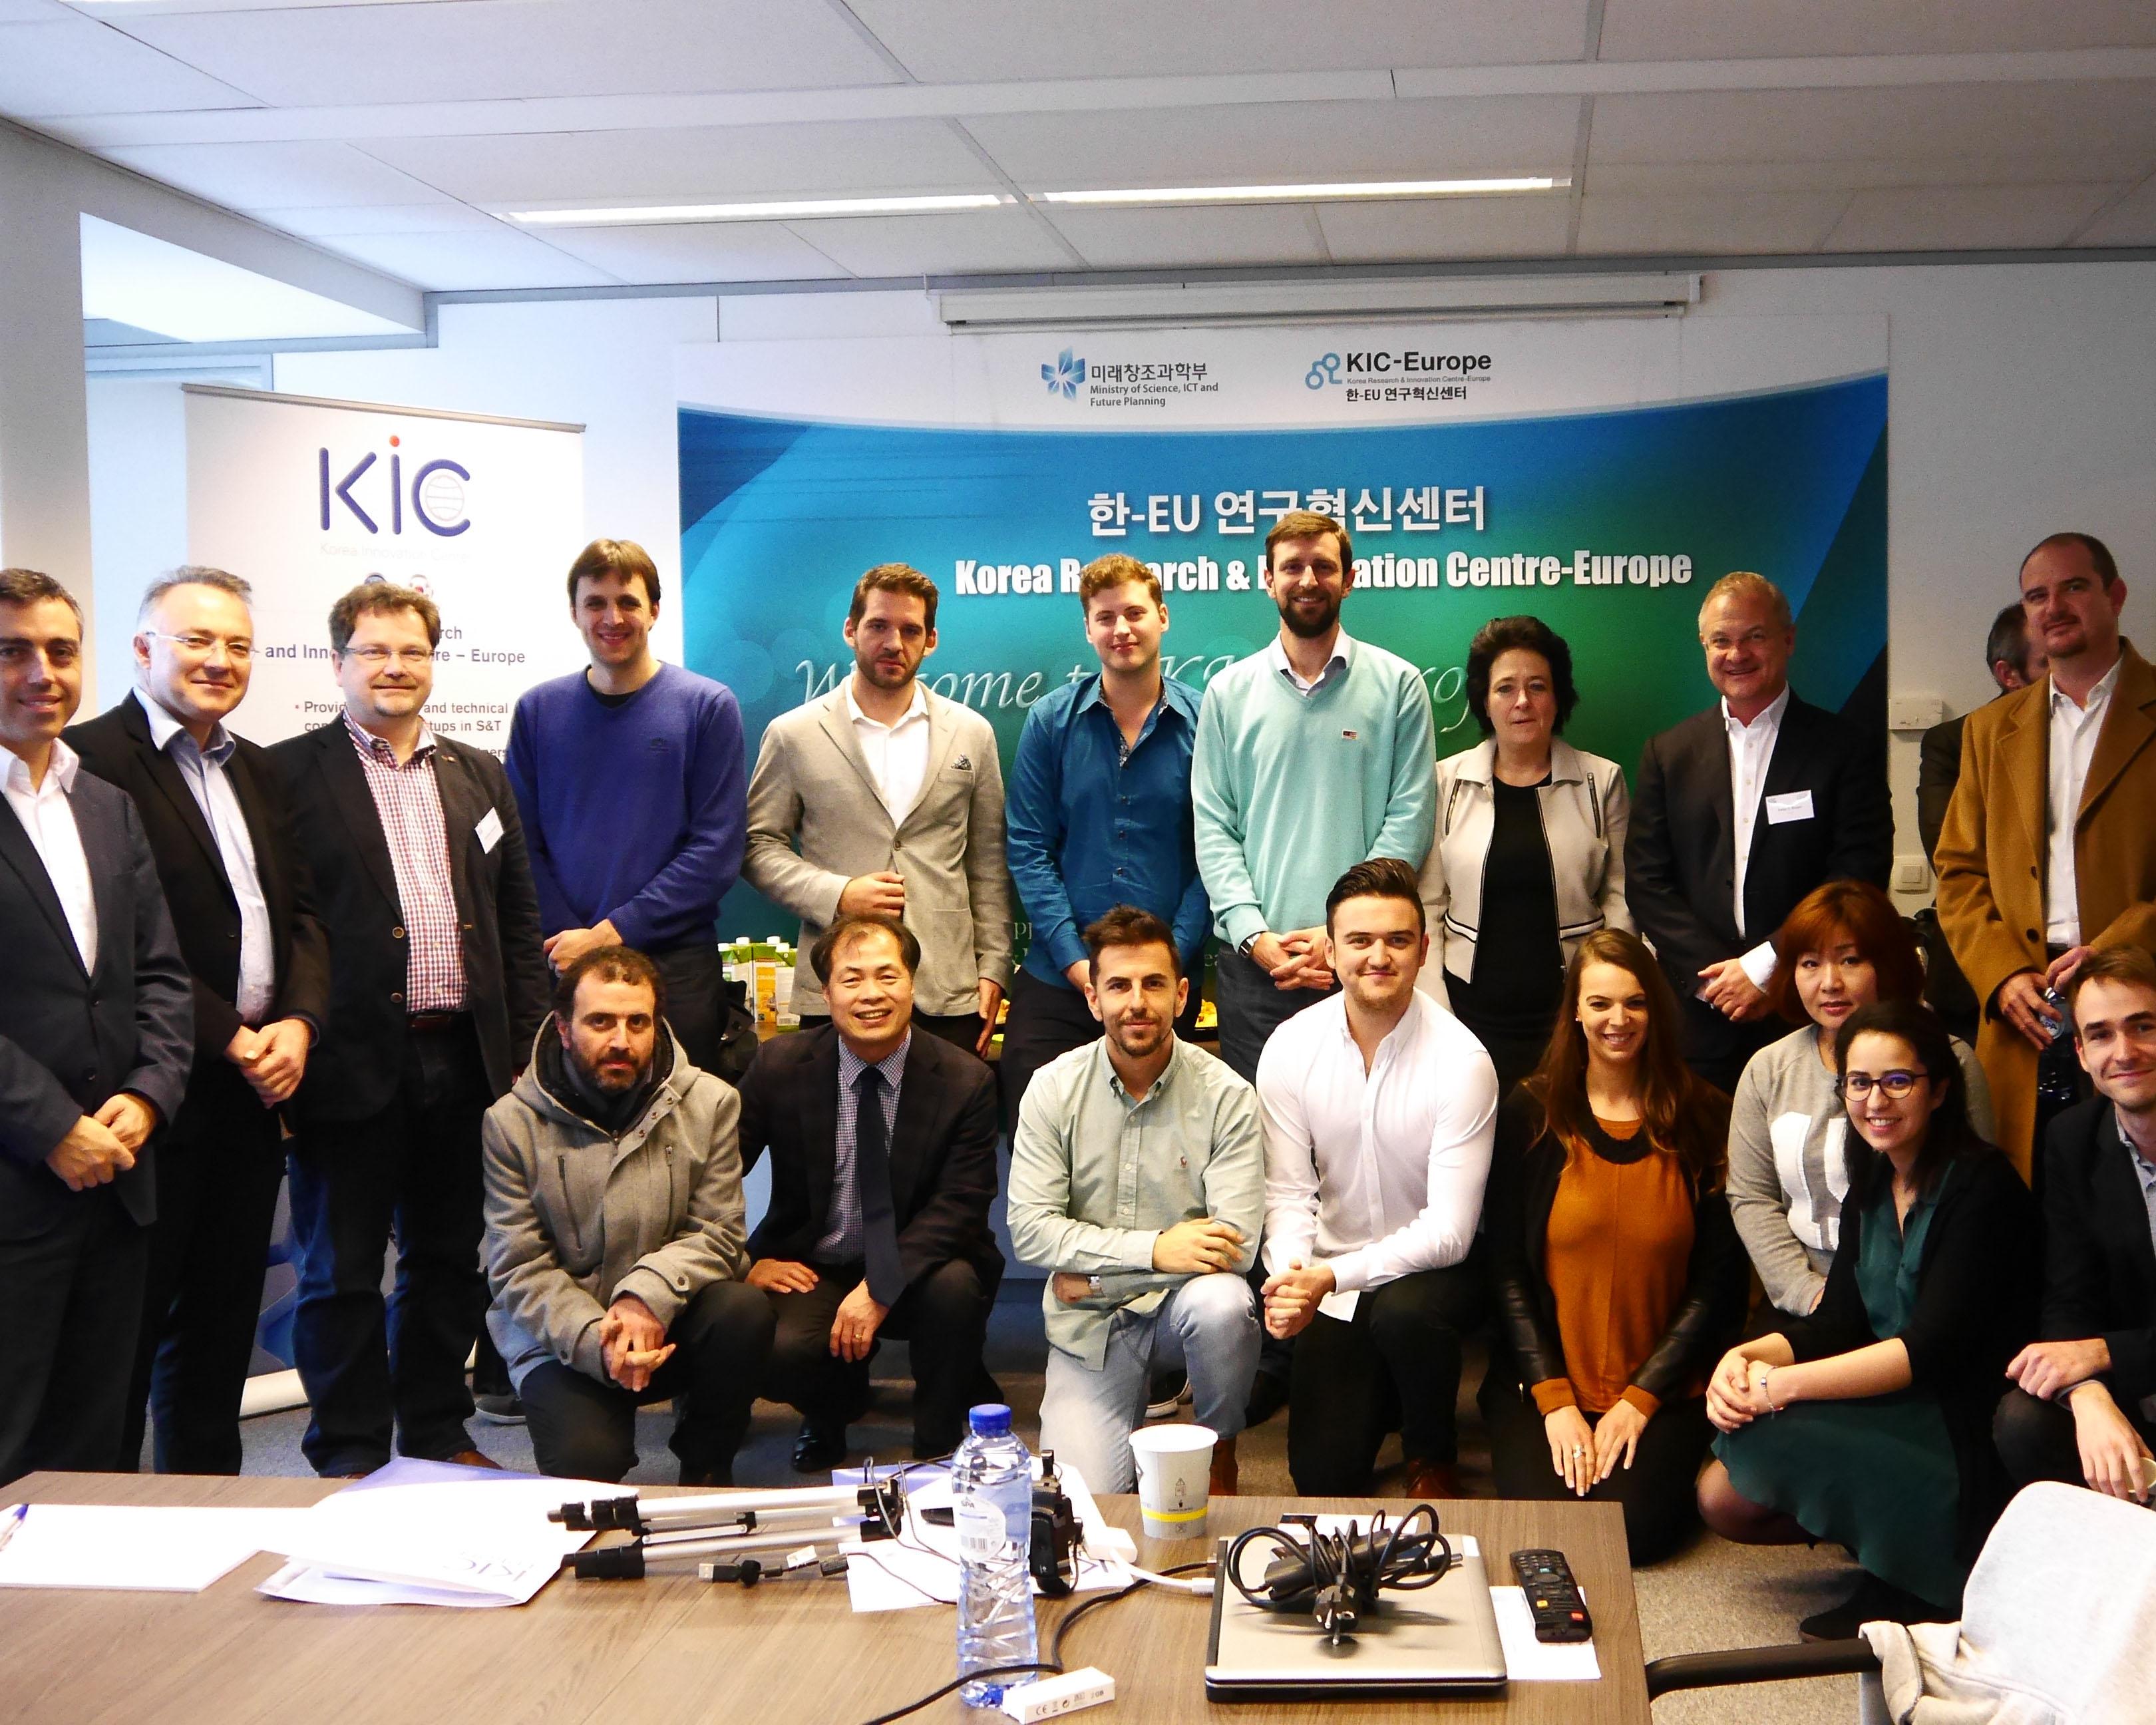 Startup Autobahn Mentor's Day 2016